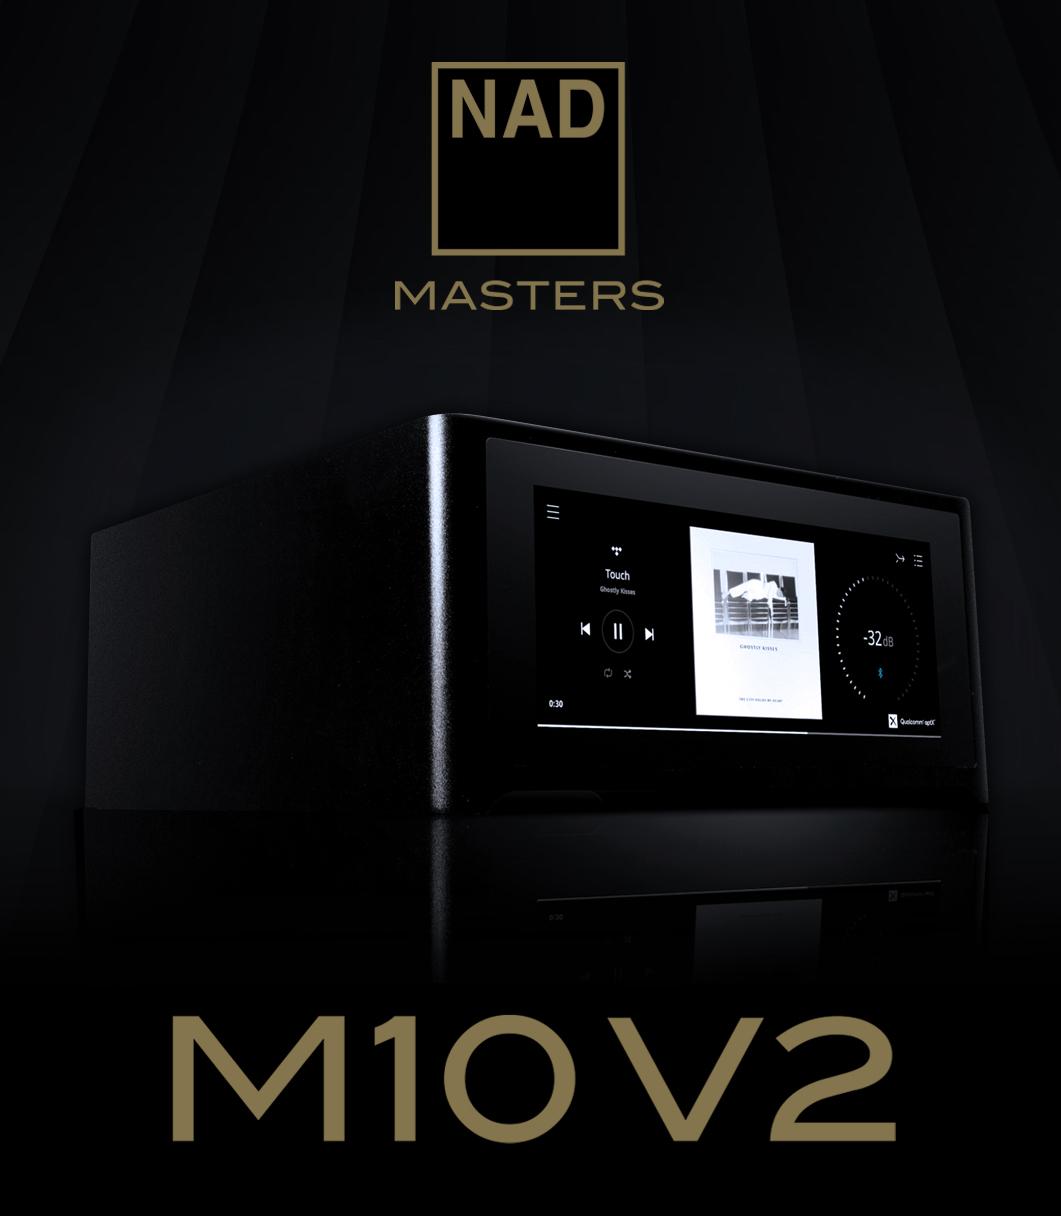 NAD Masters M10V2